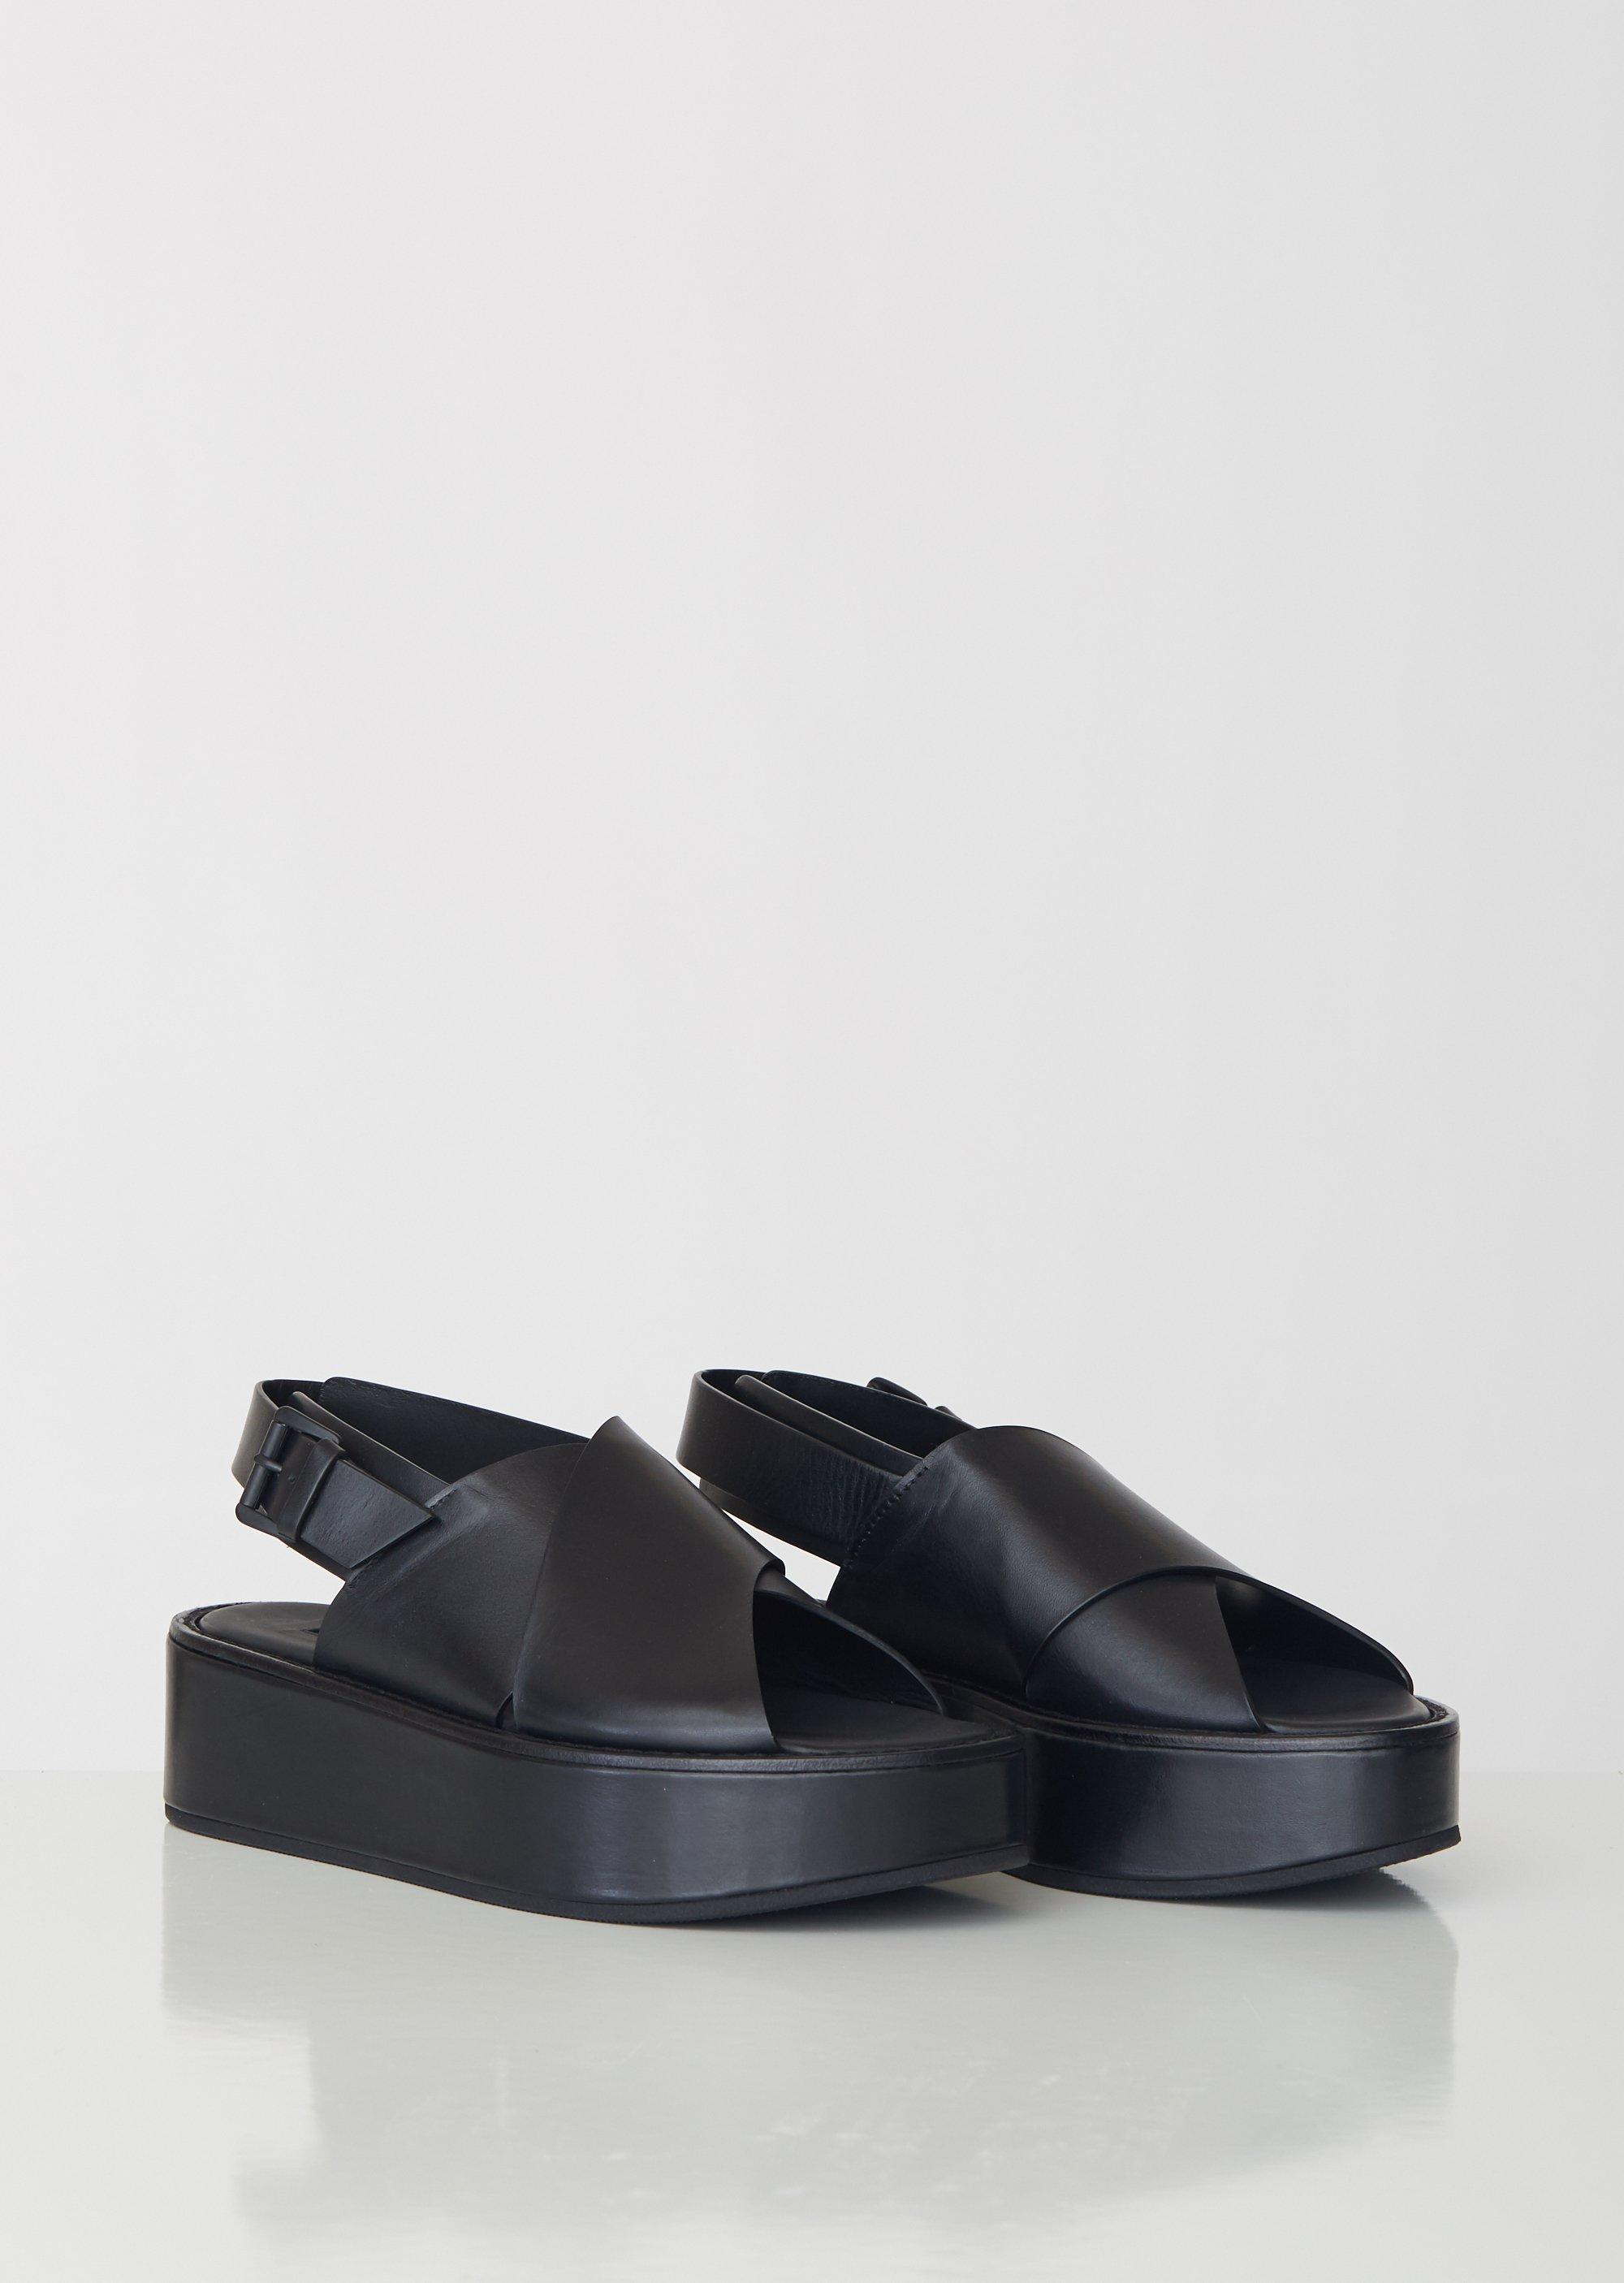 667f6f81248d Ann Demeulemeester - Black Nero Platform Sandals - Lyst. View fullscreen